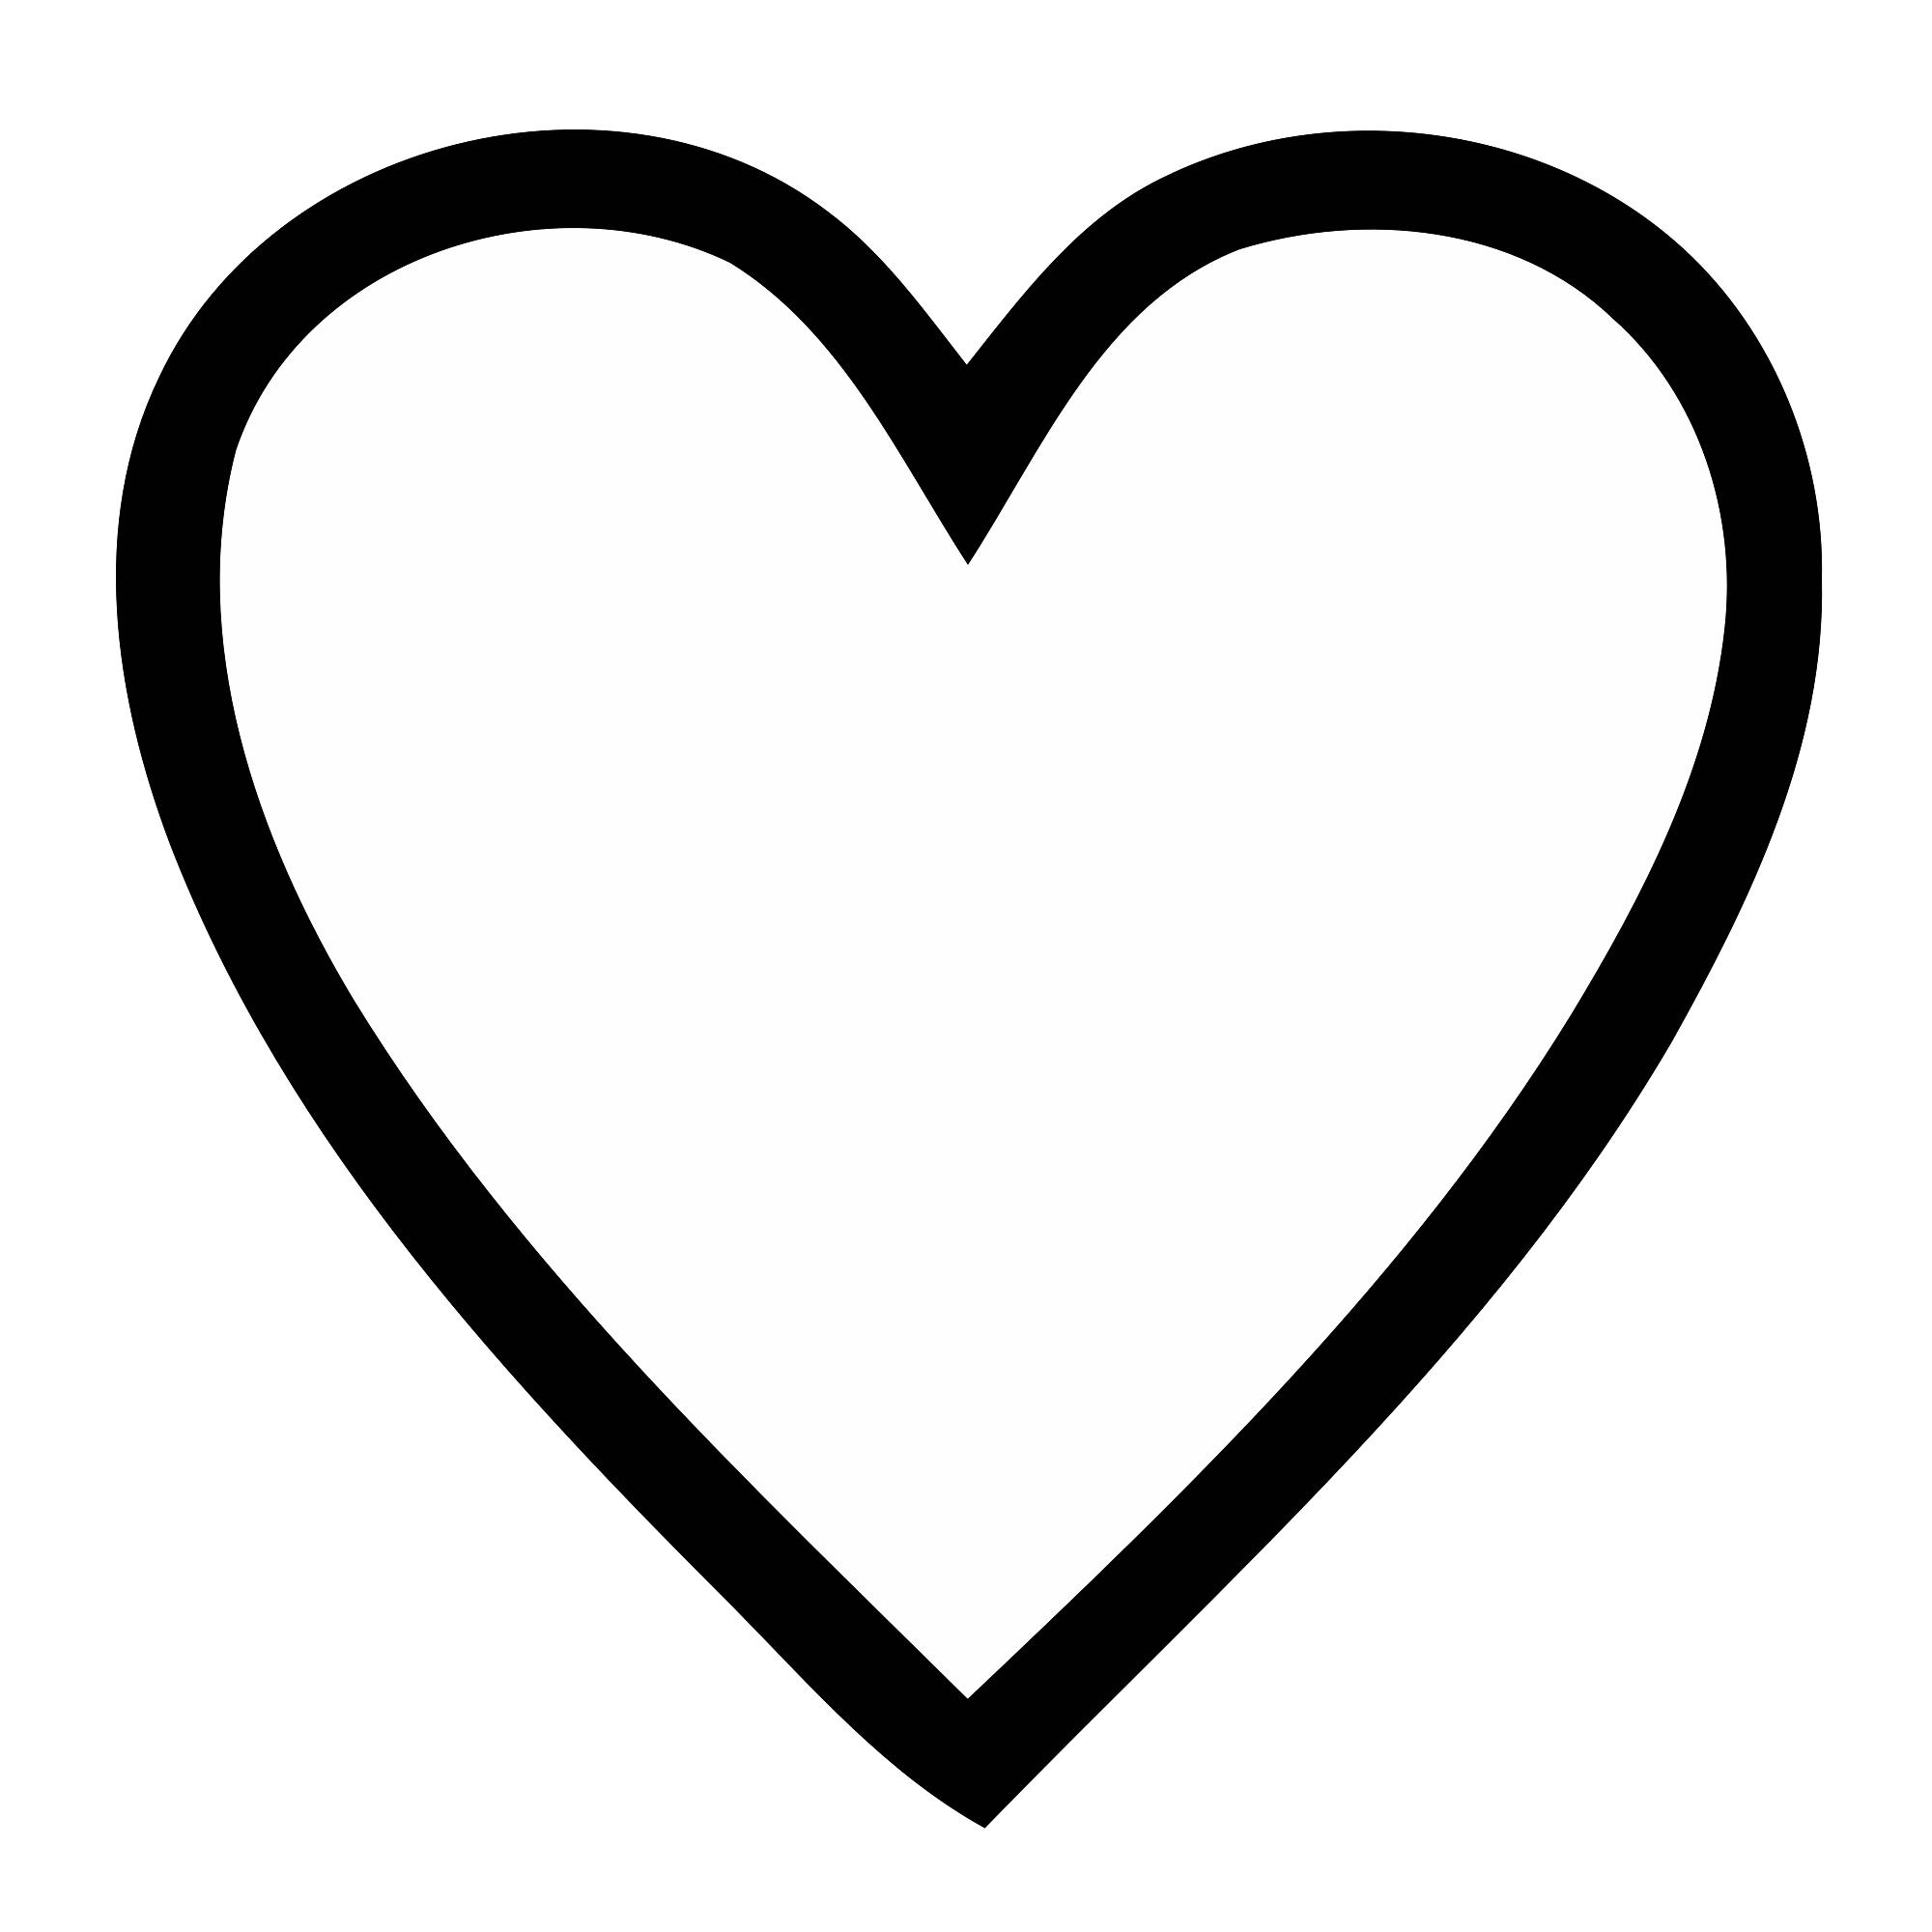 Hearts Tumblr